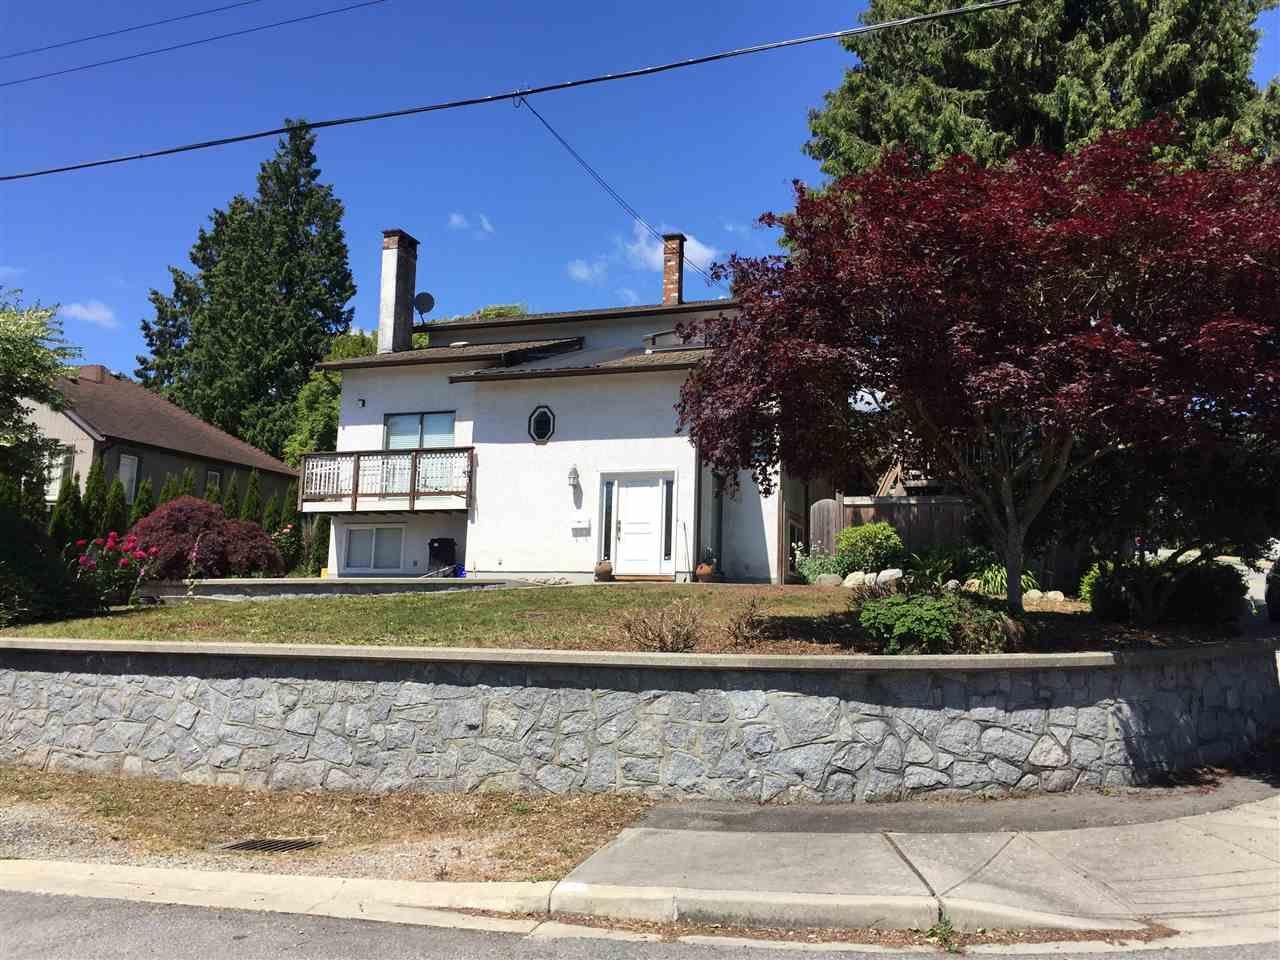 Photo 5: Photos: 1507 JEFFERSON AVENUE in West Vancouver: Ambleside House for sale : MLS®# R2274486